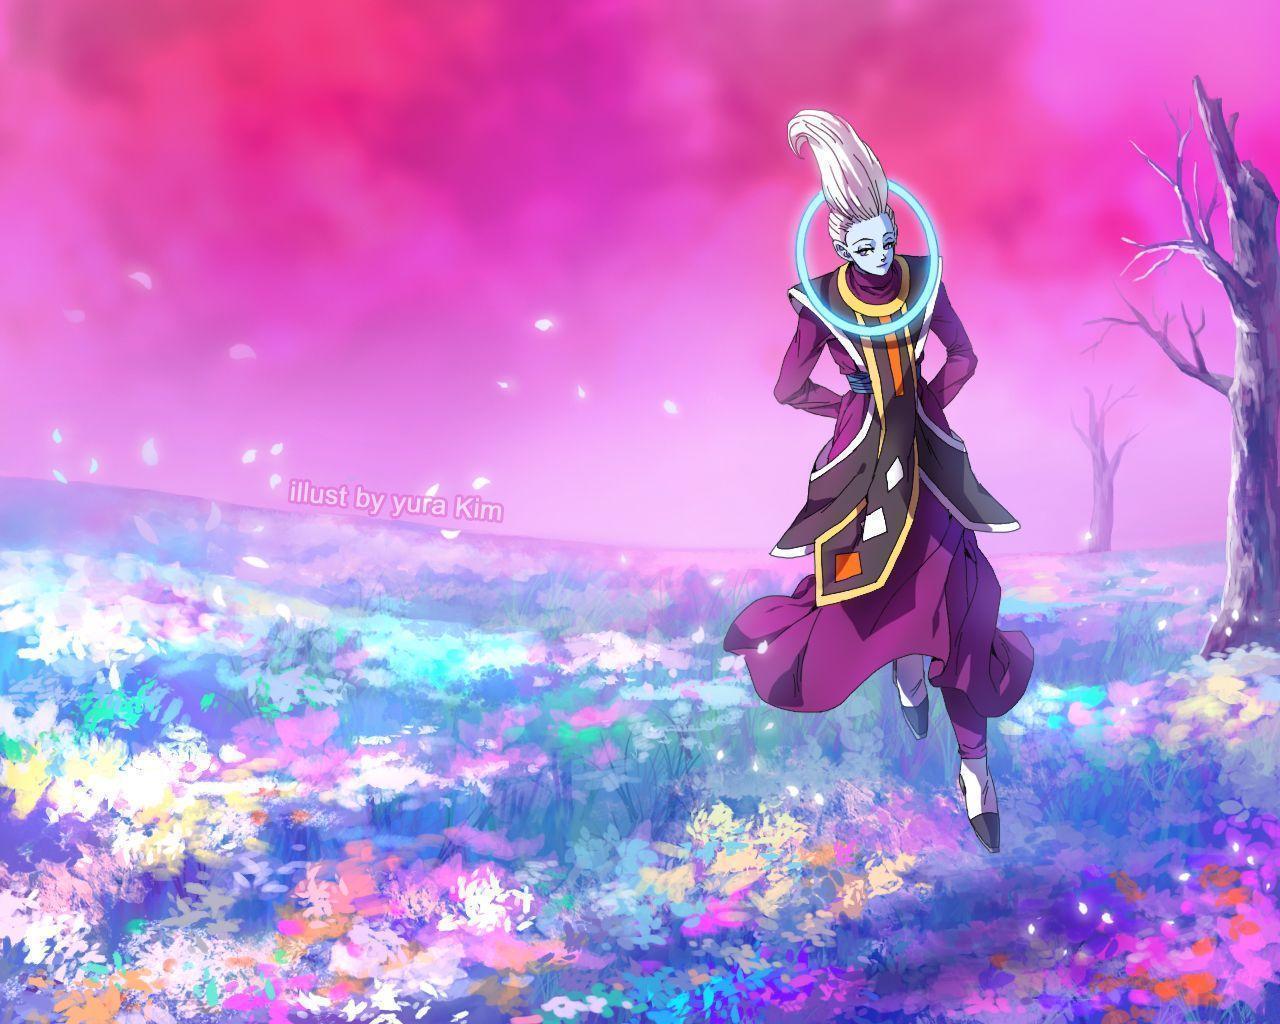 Anime Wallpaper Hd Wallpaper Whis Dragon Ball